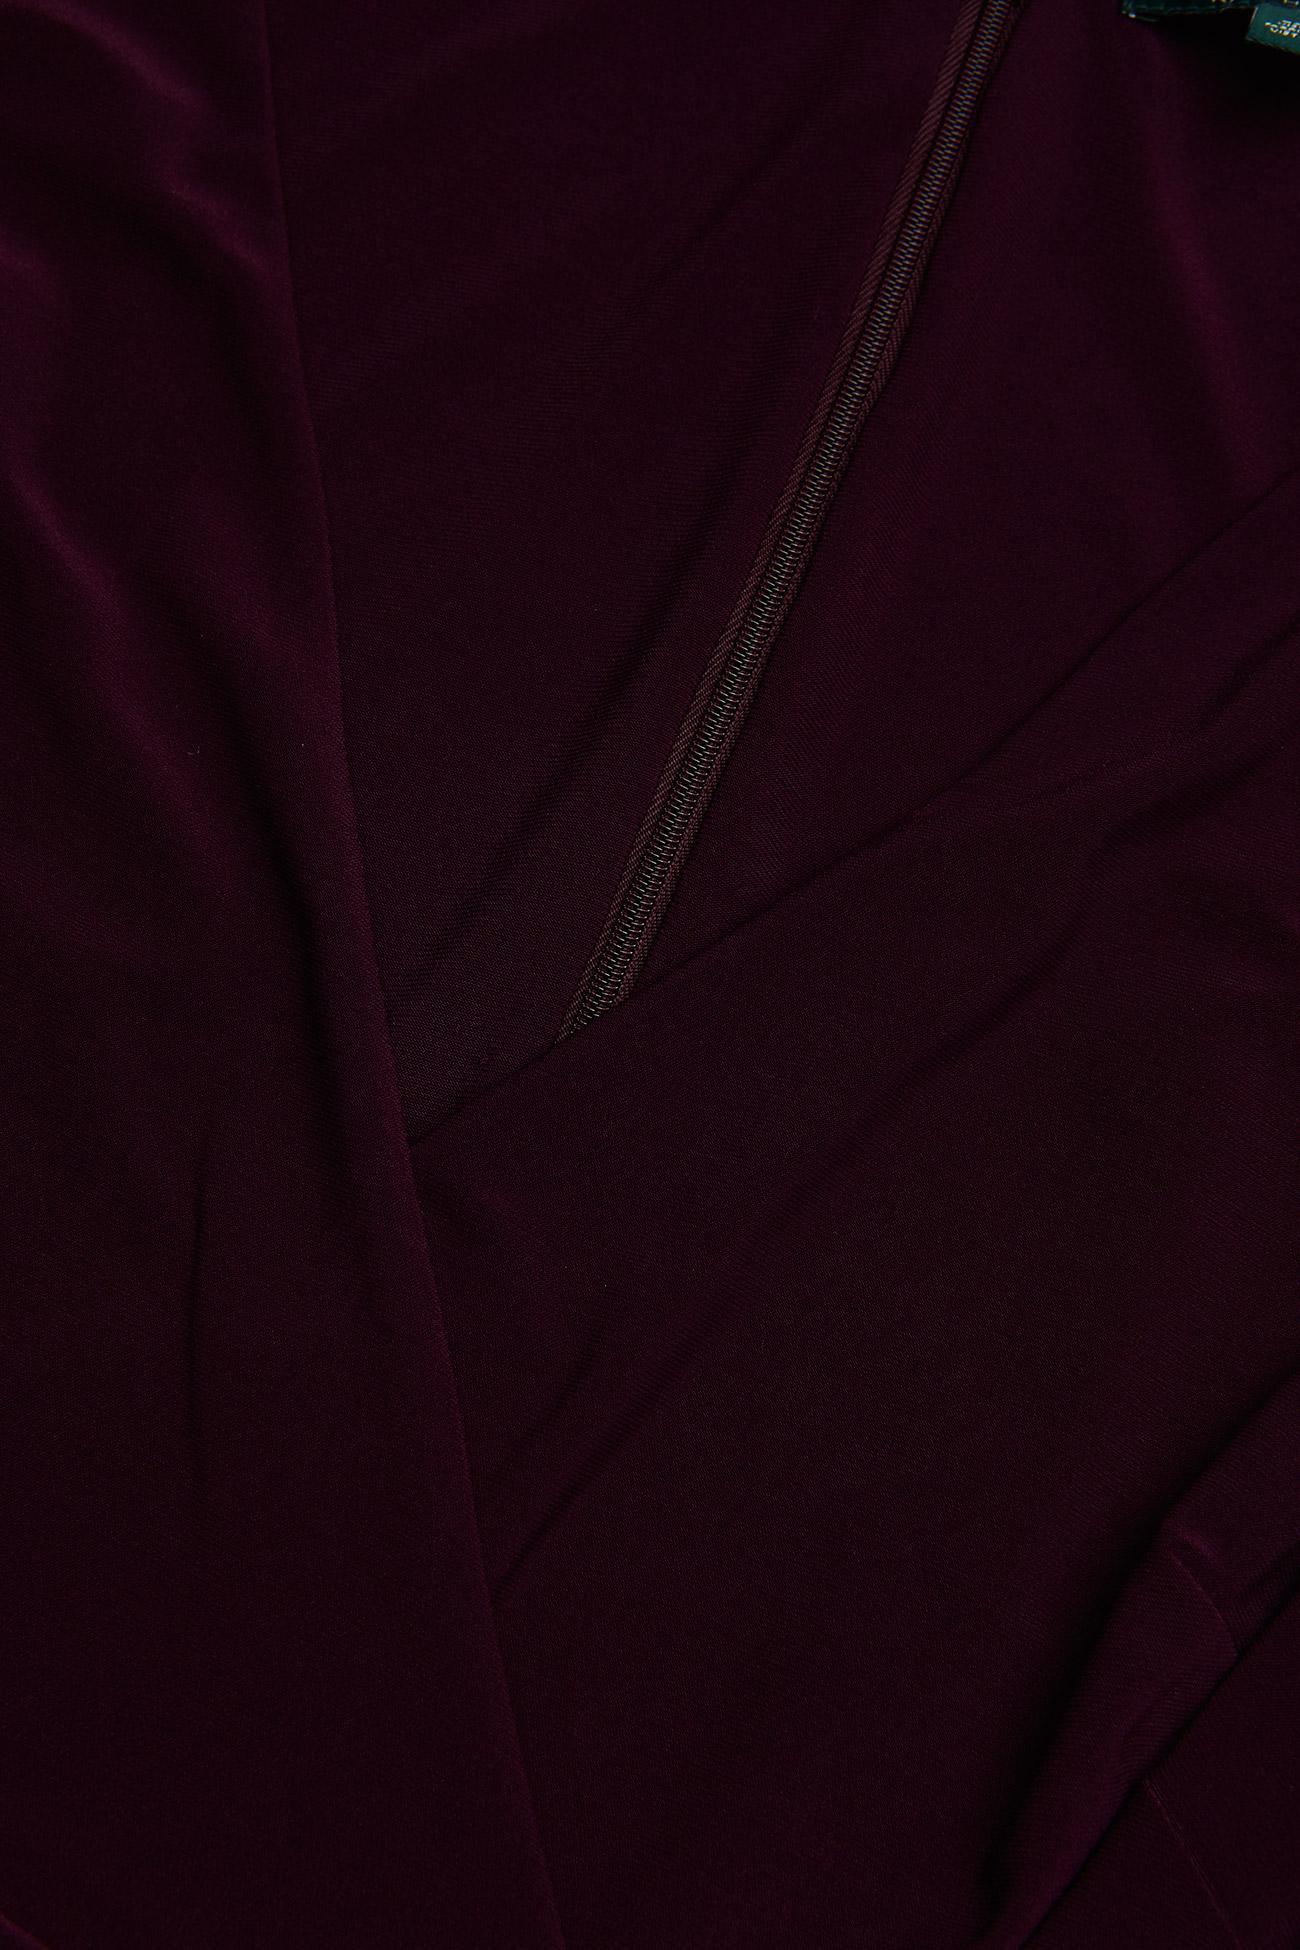 sleeve Jersey PlumLauren Cap Ralph Dresspassion DYW29EHI